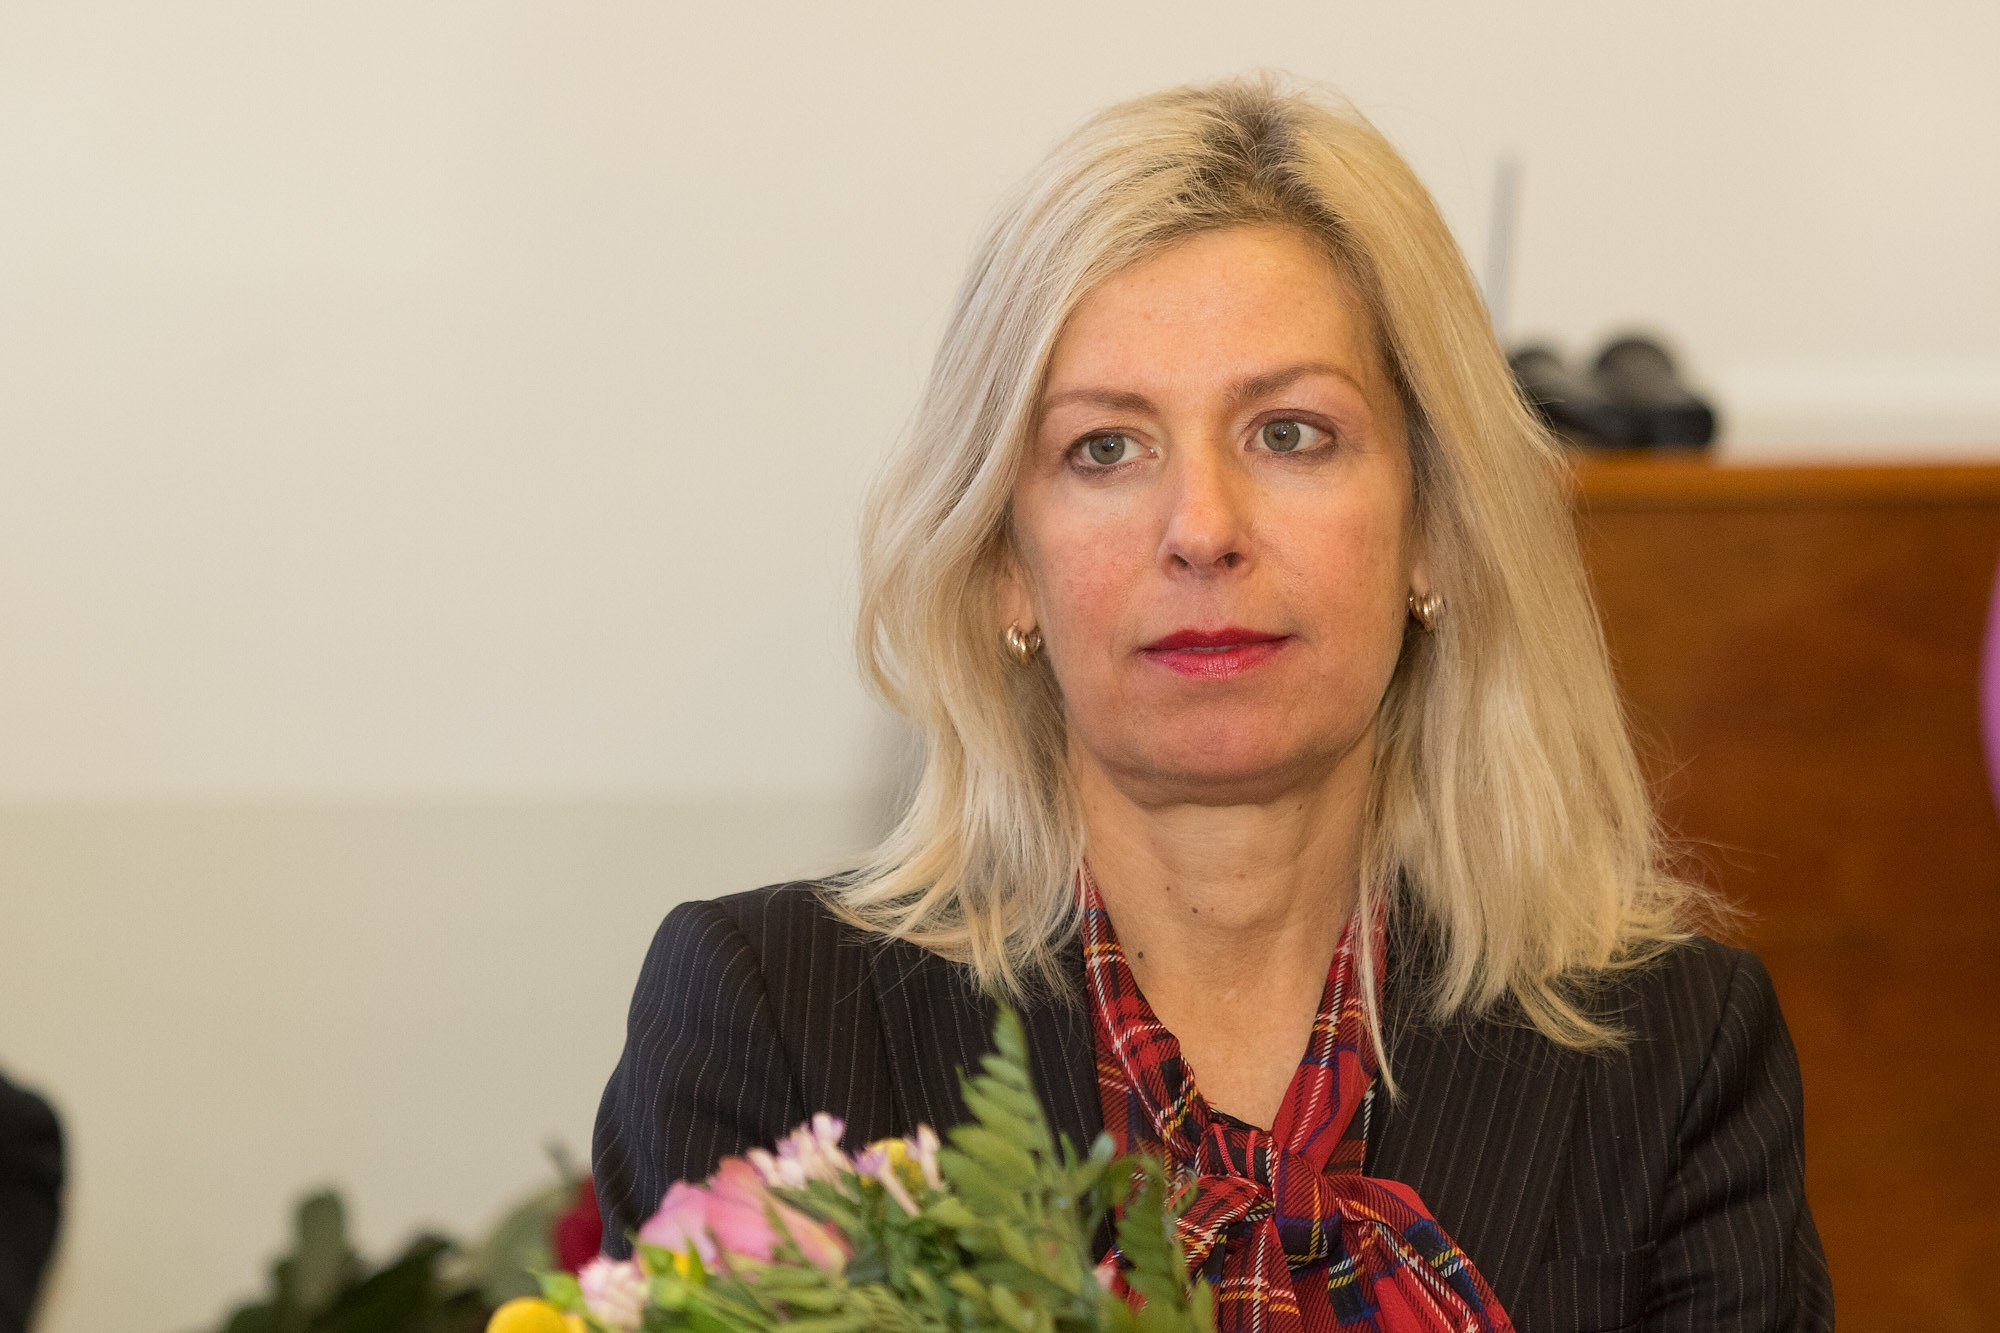 Галина Скоробогатова будет кандидатом на выборах в Европарламент